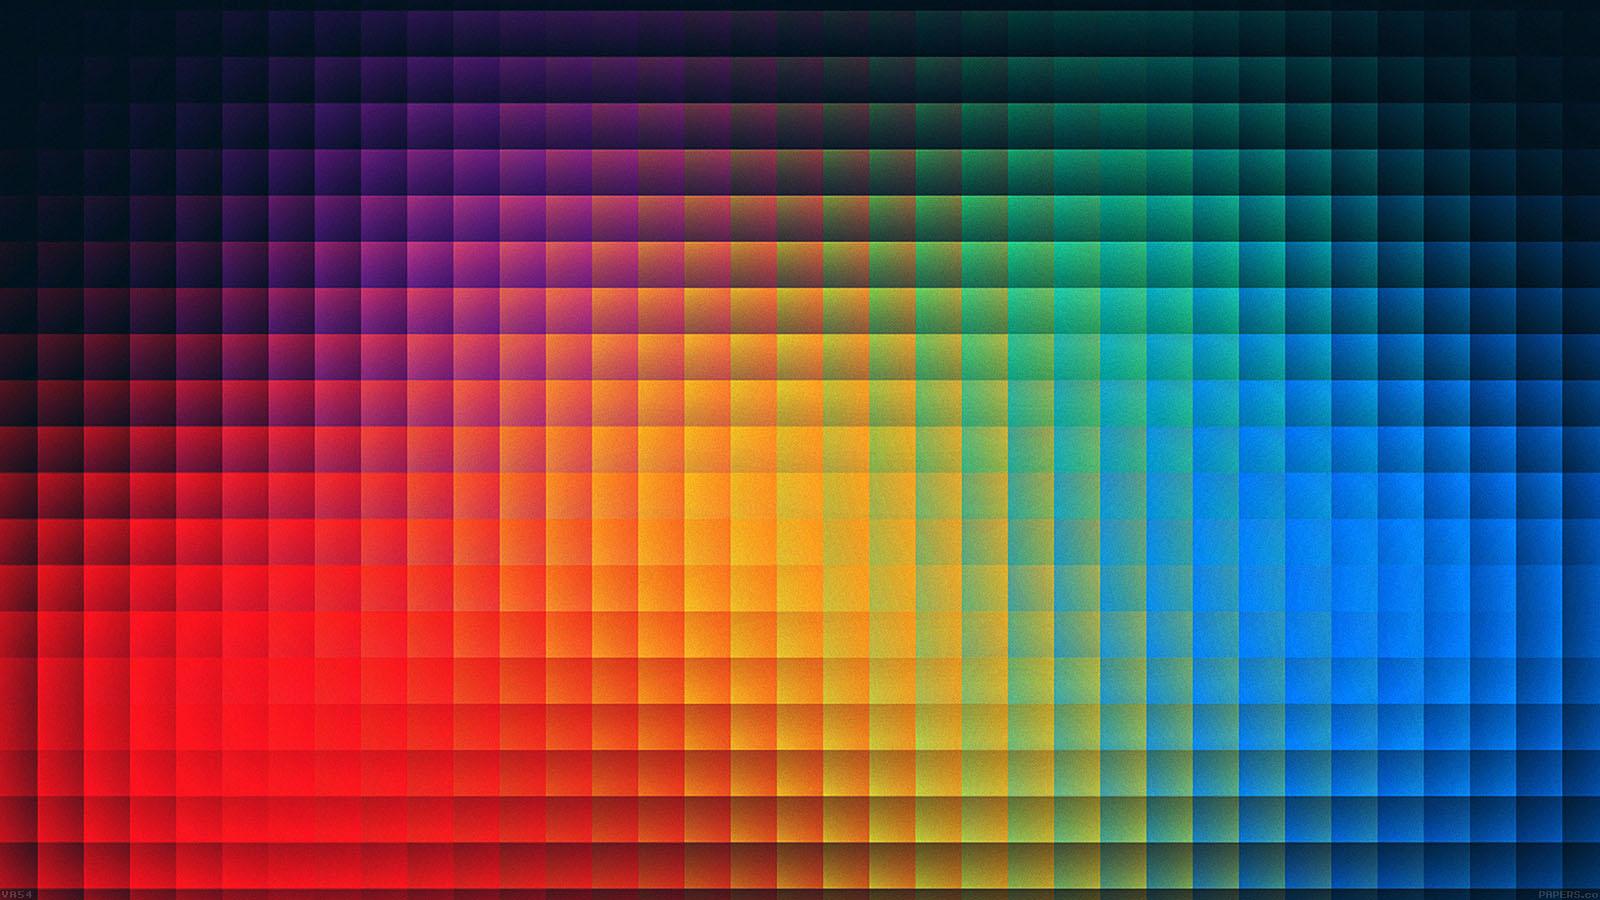 va54-rainbow-pixels-pattern - Papers.co